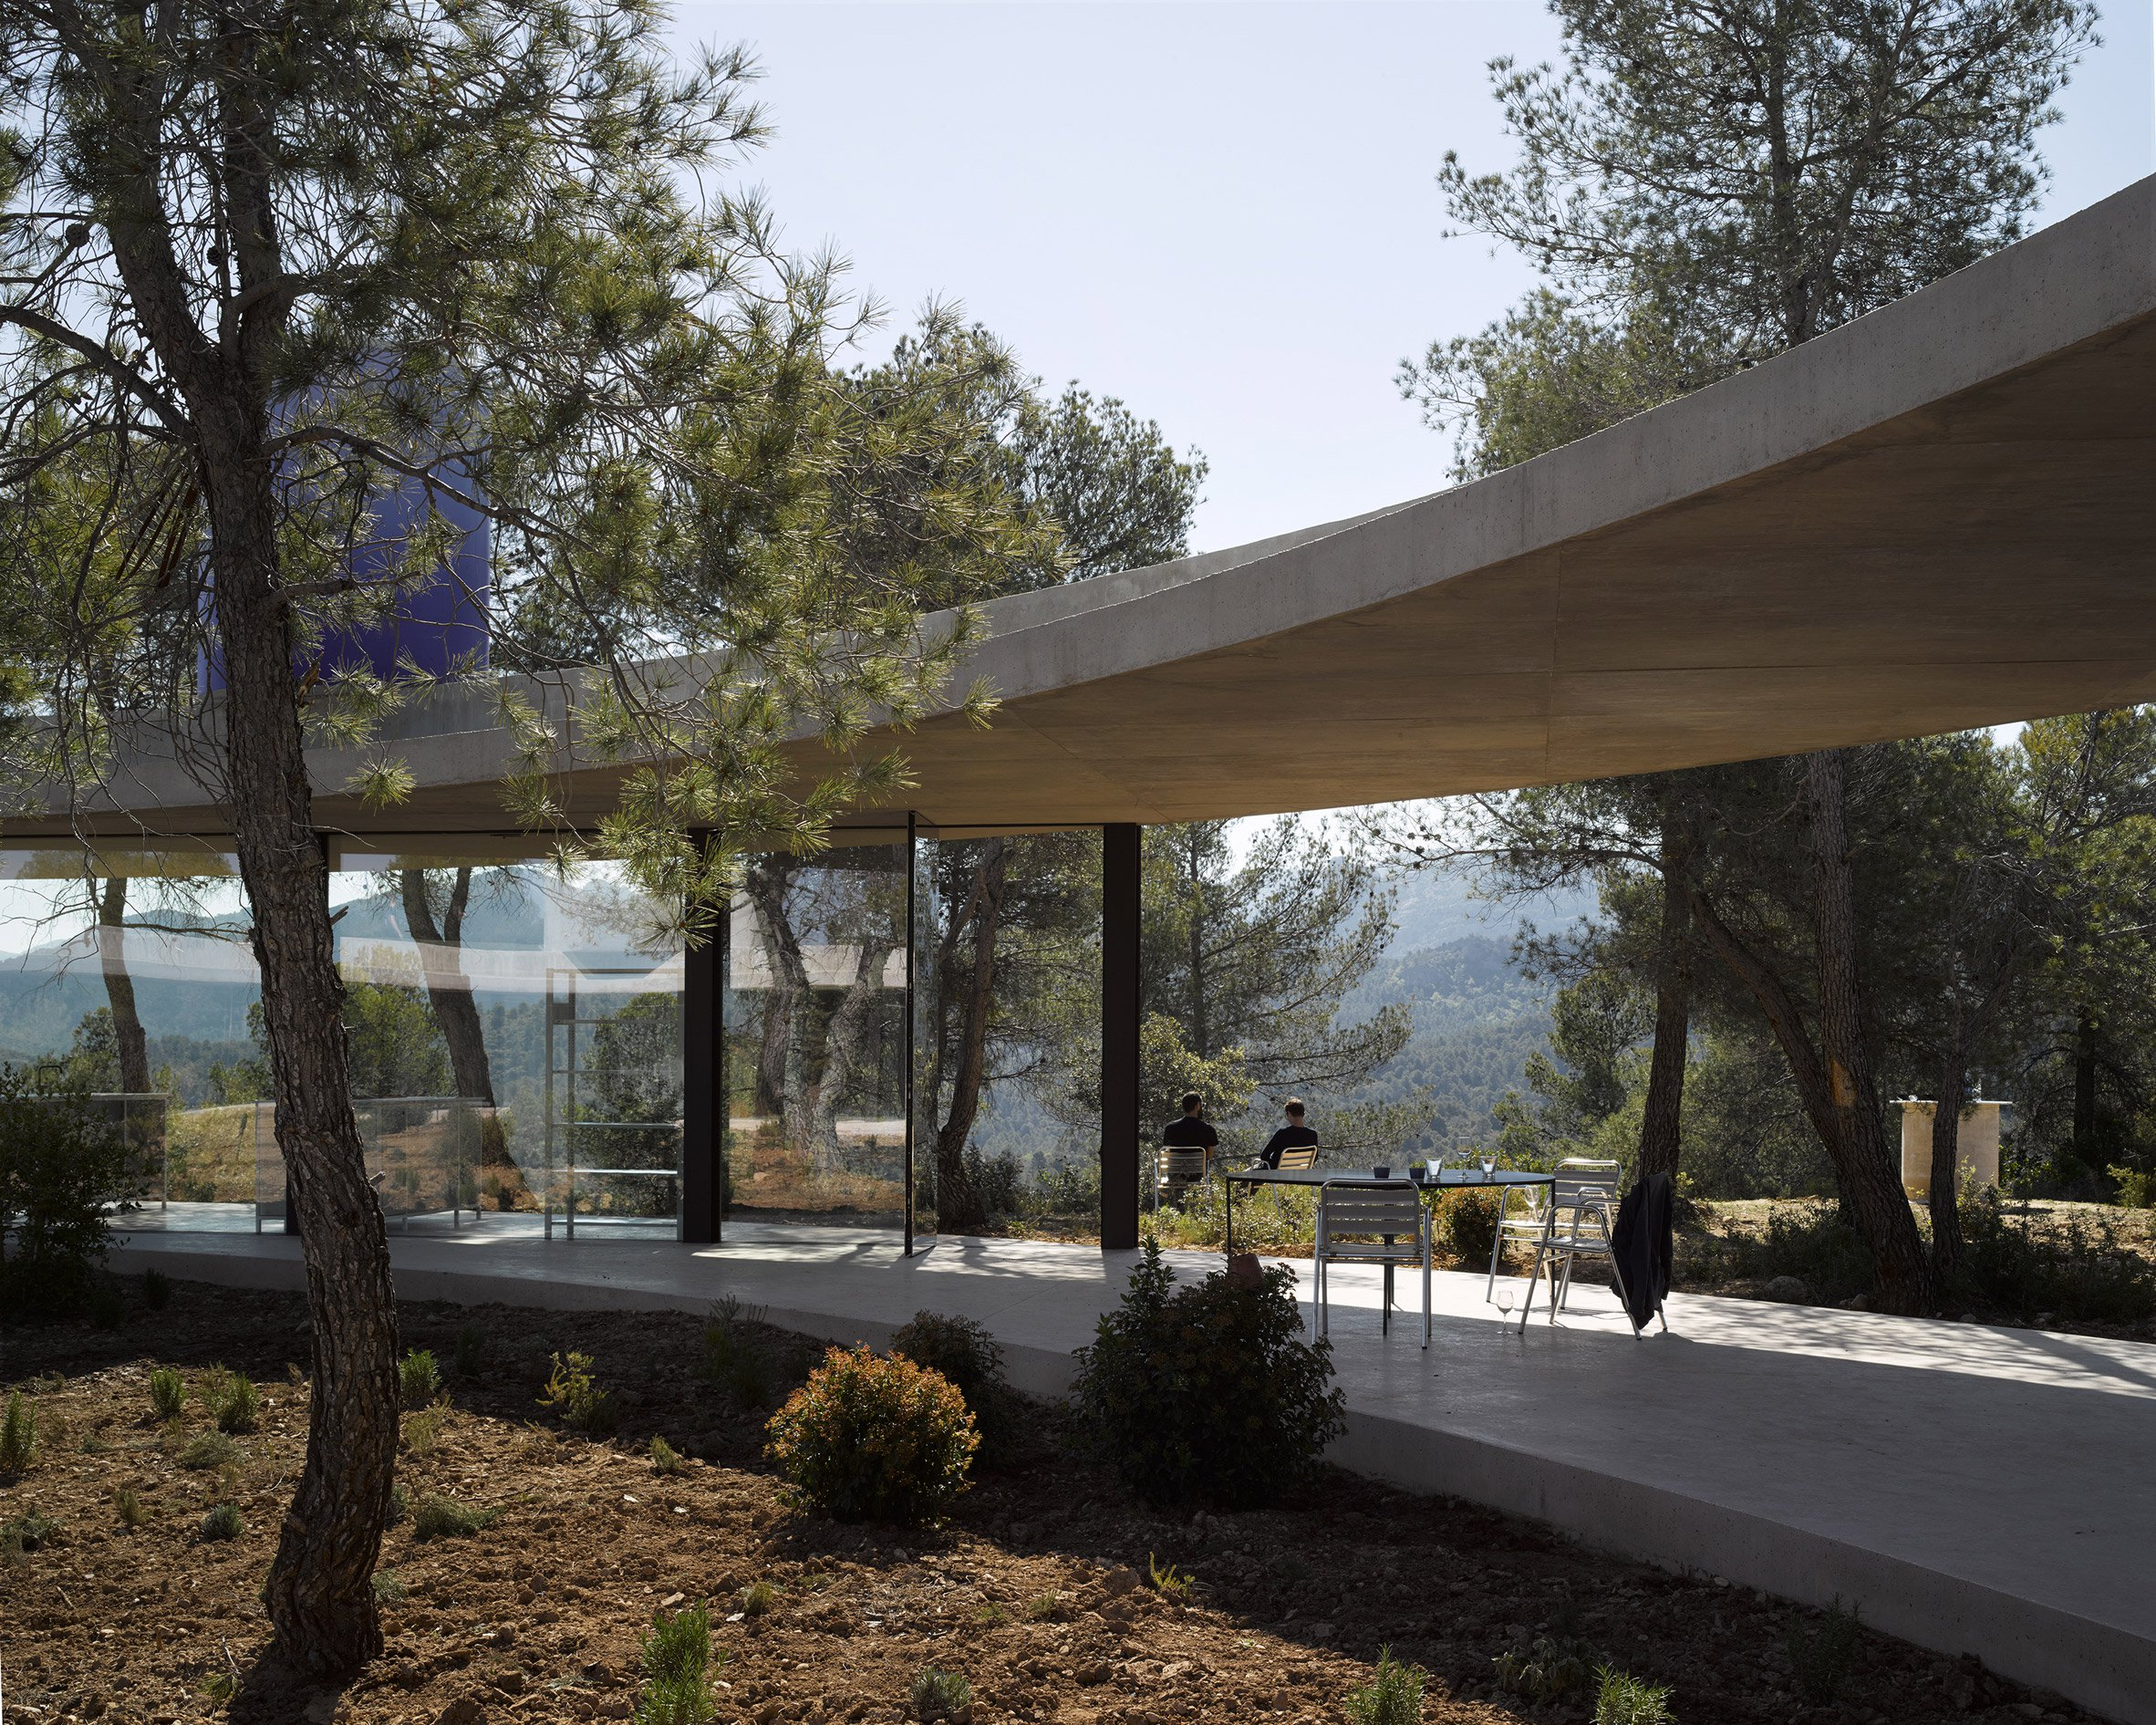 3. Solo House II by Office KGDVS in Matarraña Teruel - Solo House II by Office KGDVS encircles forested hilltop in Matarraña, Teruel